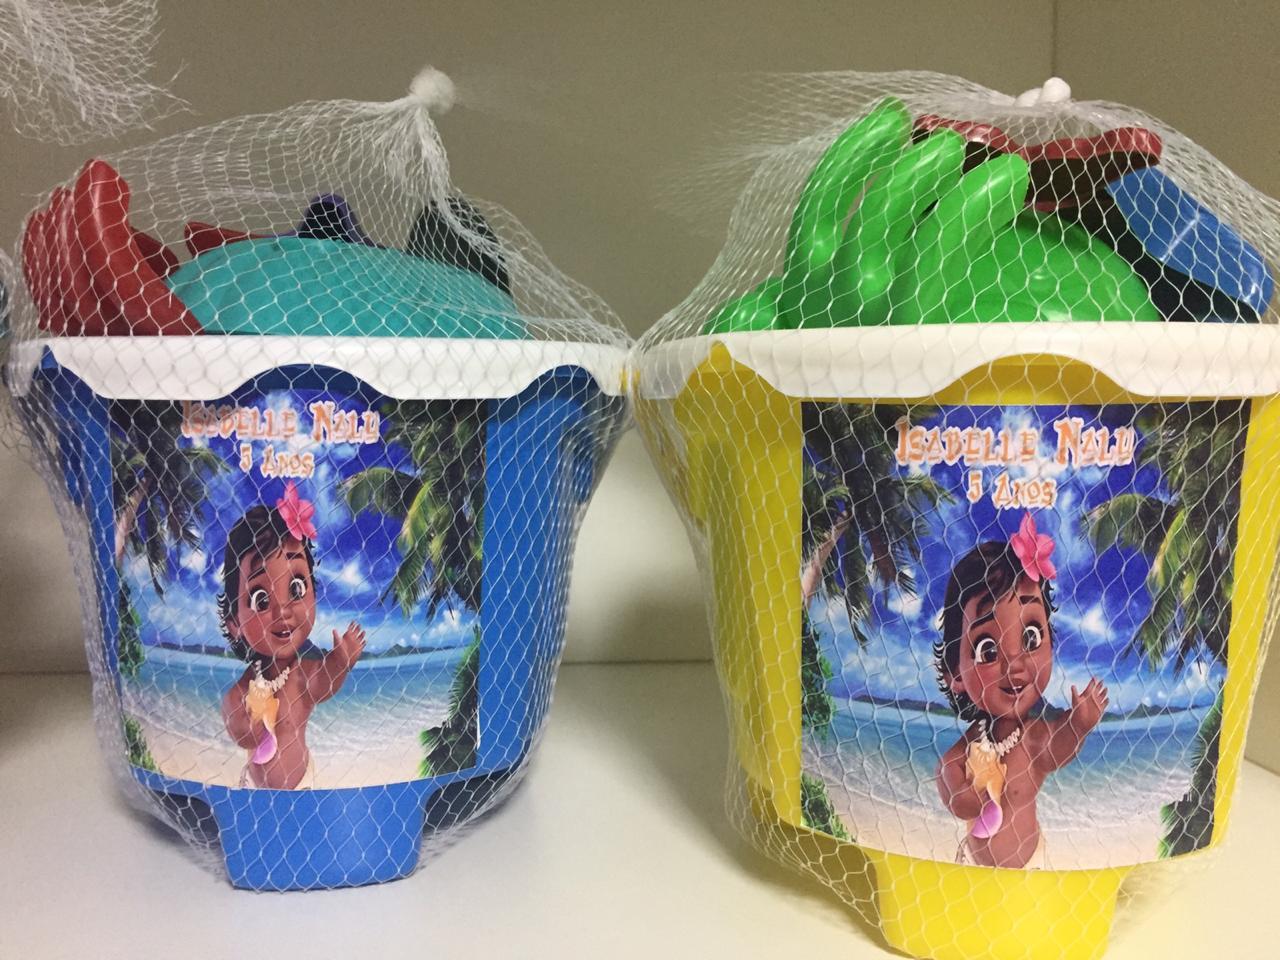 Kit com 10 baldes de praia Moana baby